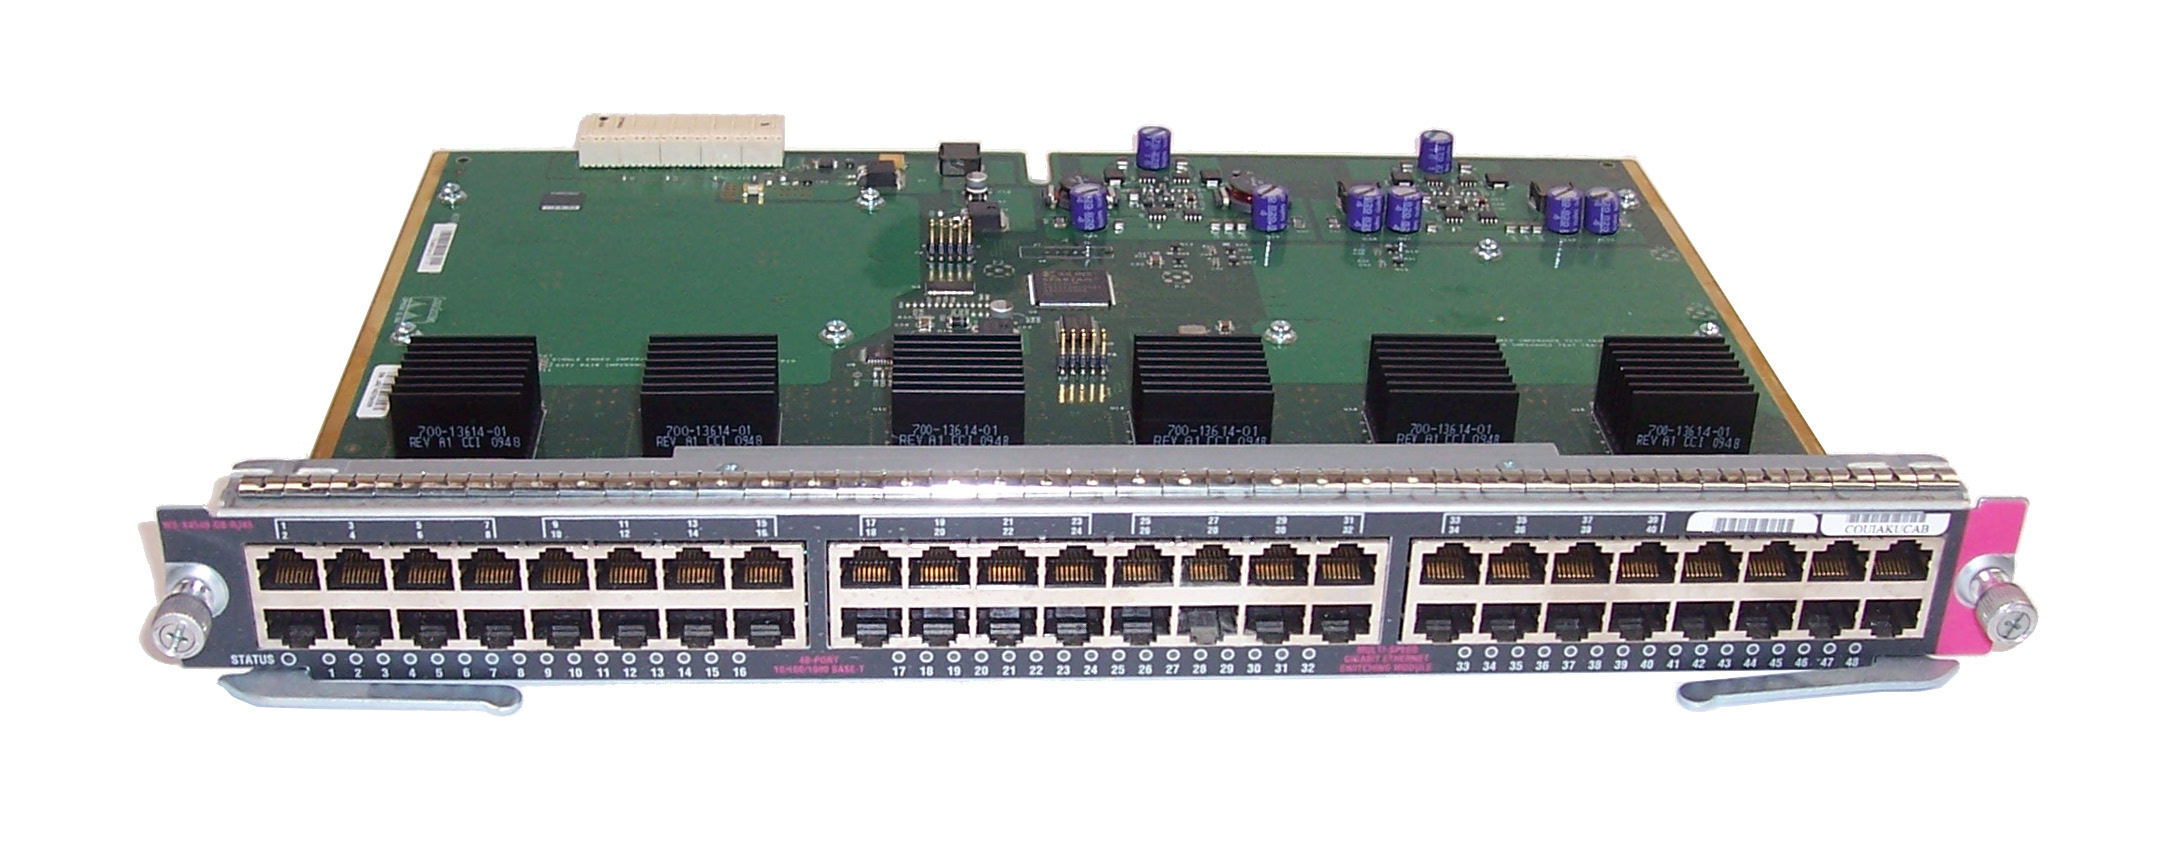 Cisco WS-X4548-GB-RJ45 V06 Catalyst 4500 Gigabit Ethernet Switching Module